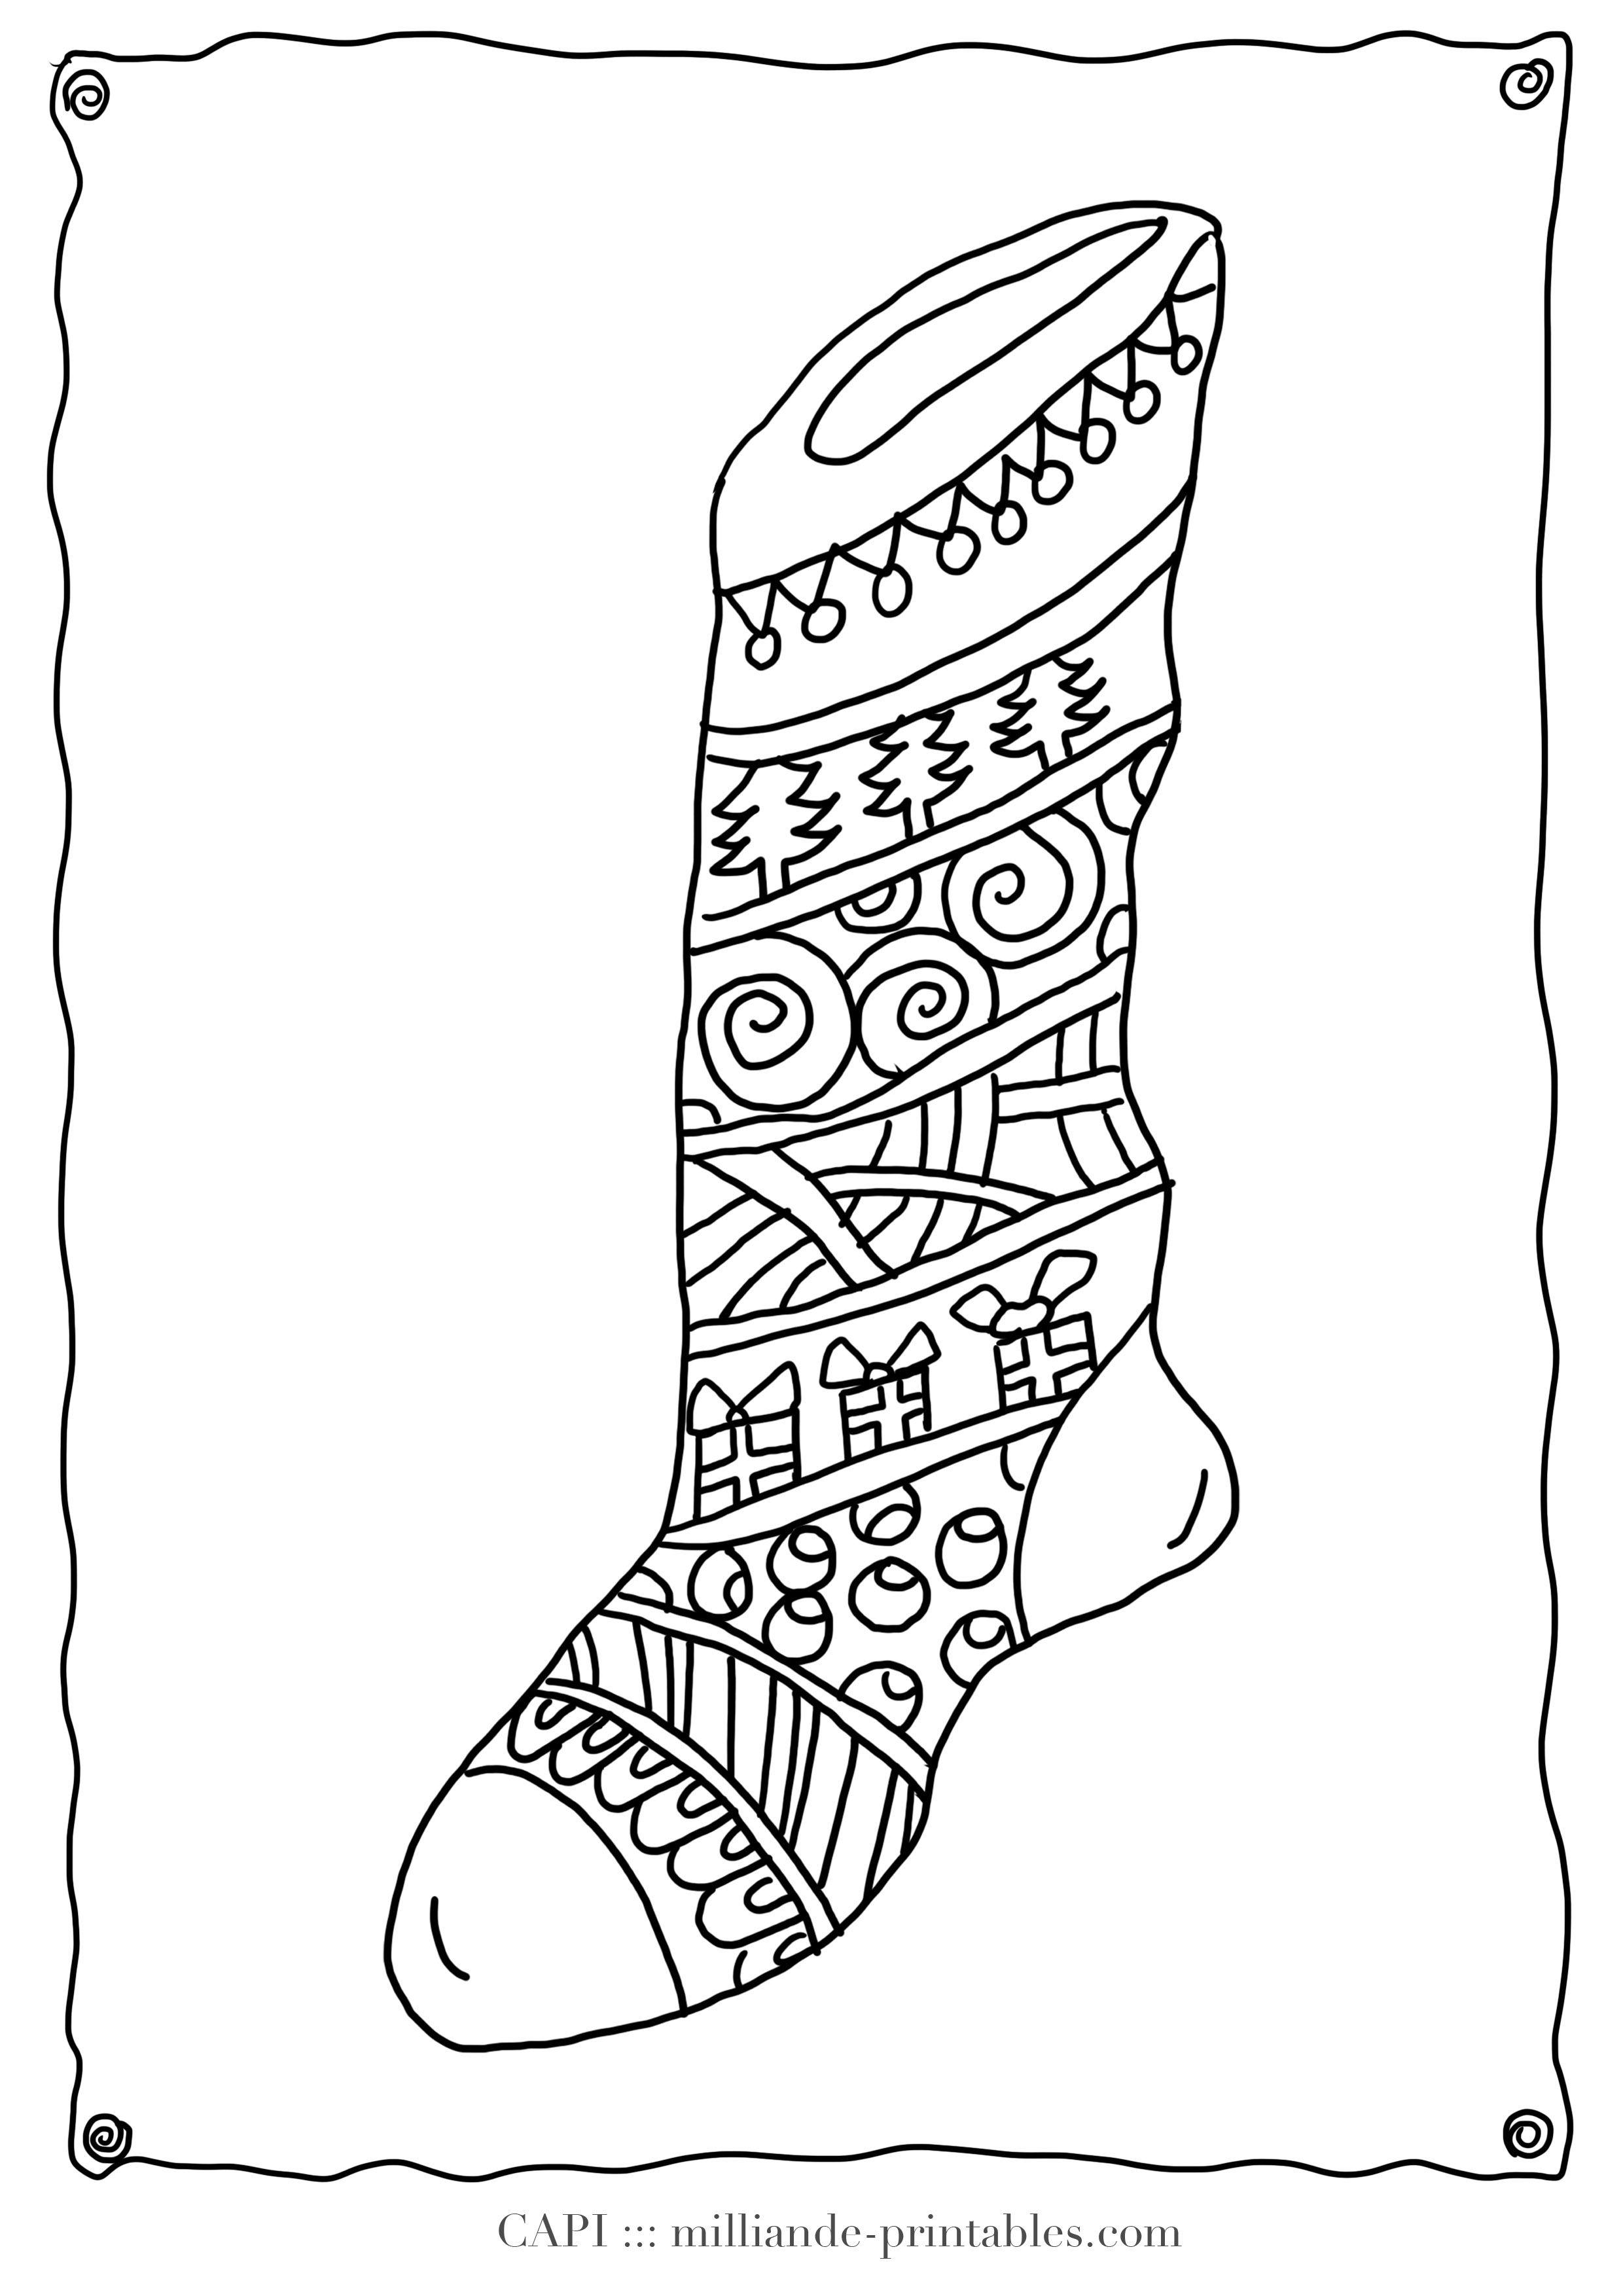 Christmas Coloring Page Stocking Milliande S Original Free Christmas Coloring Sheets